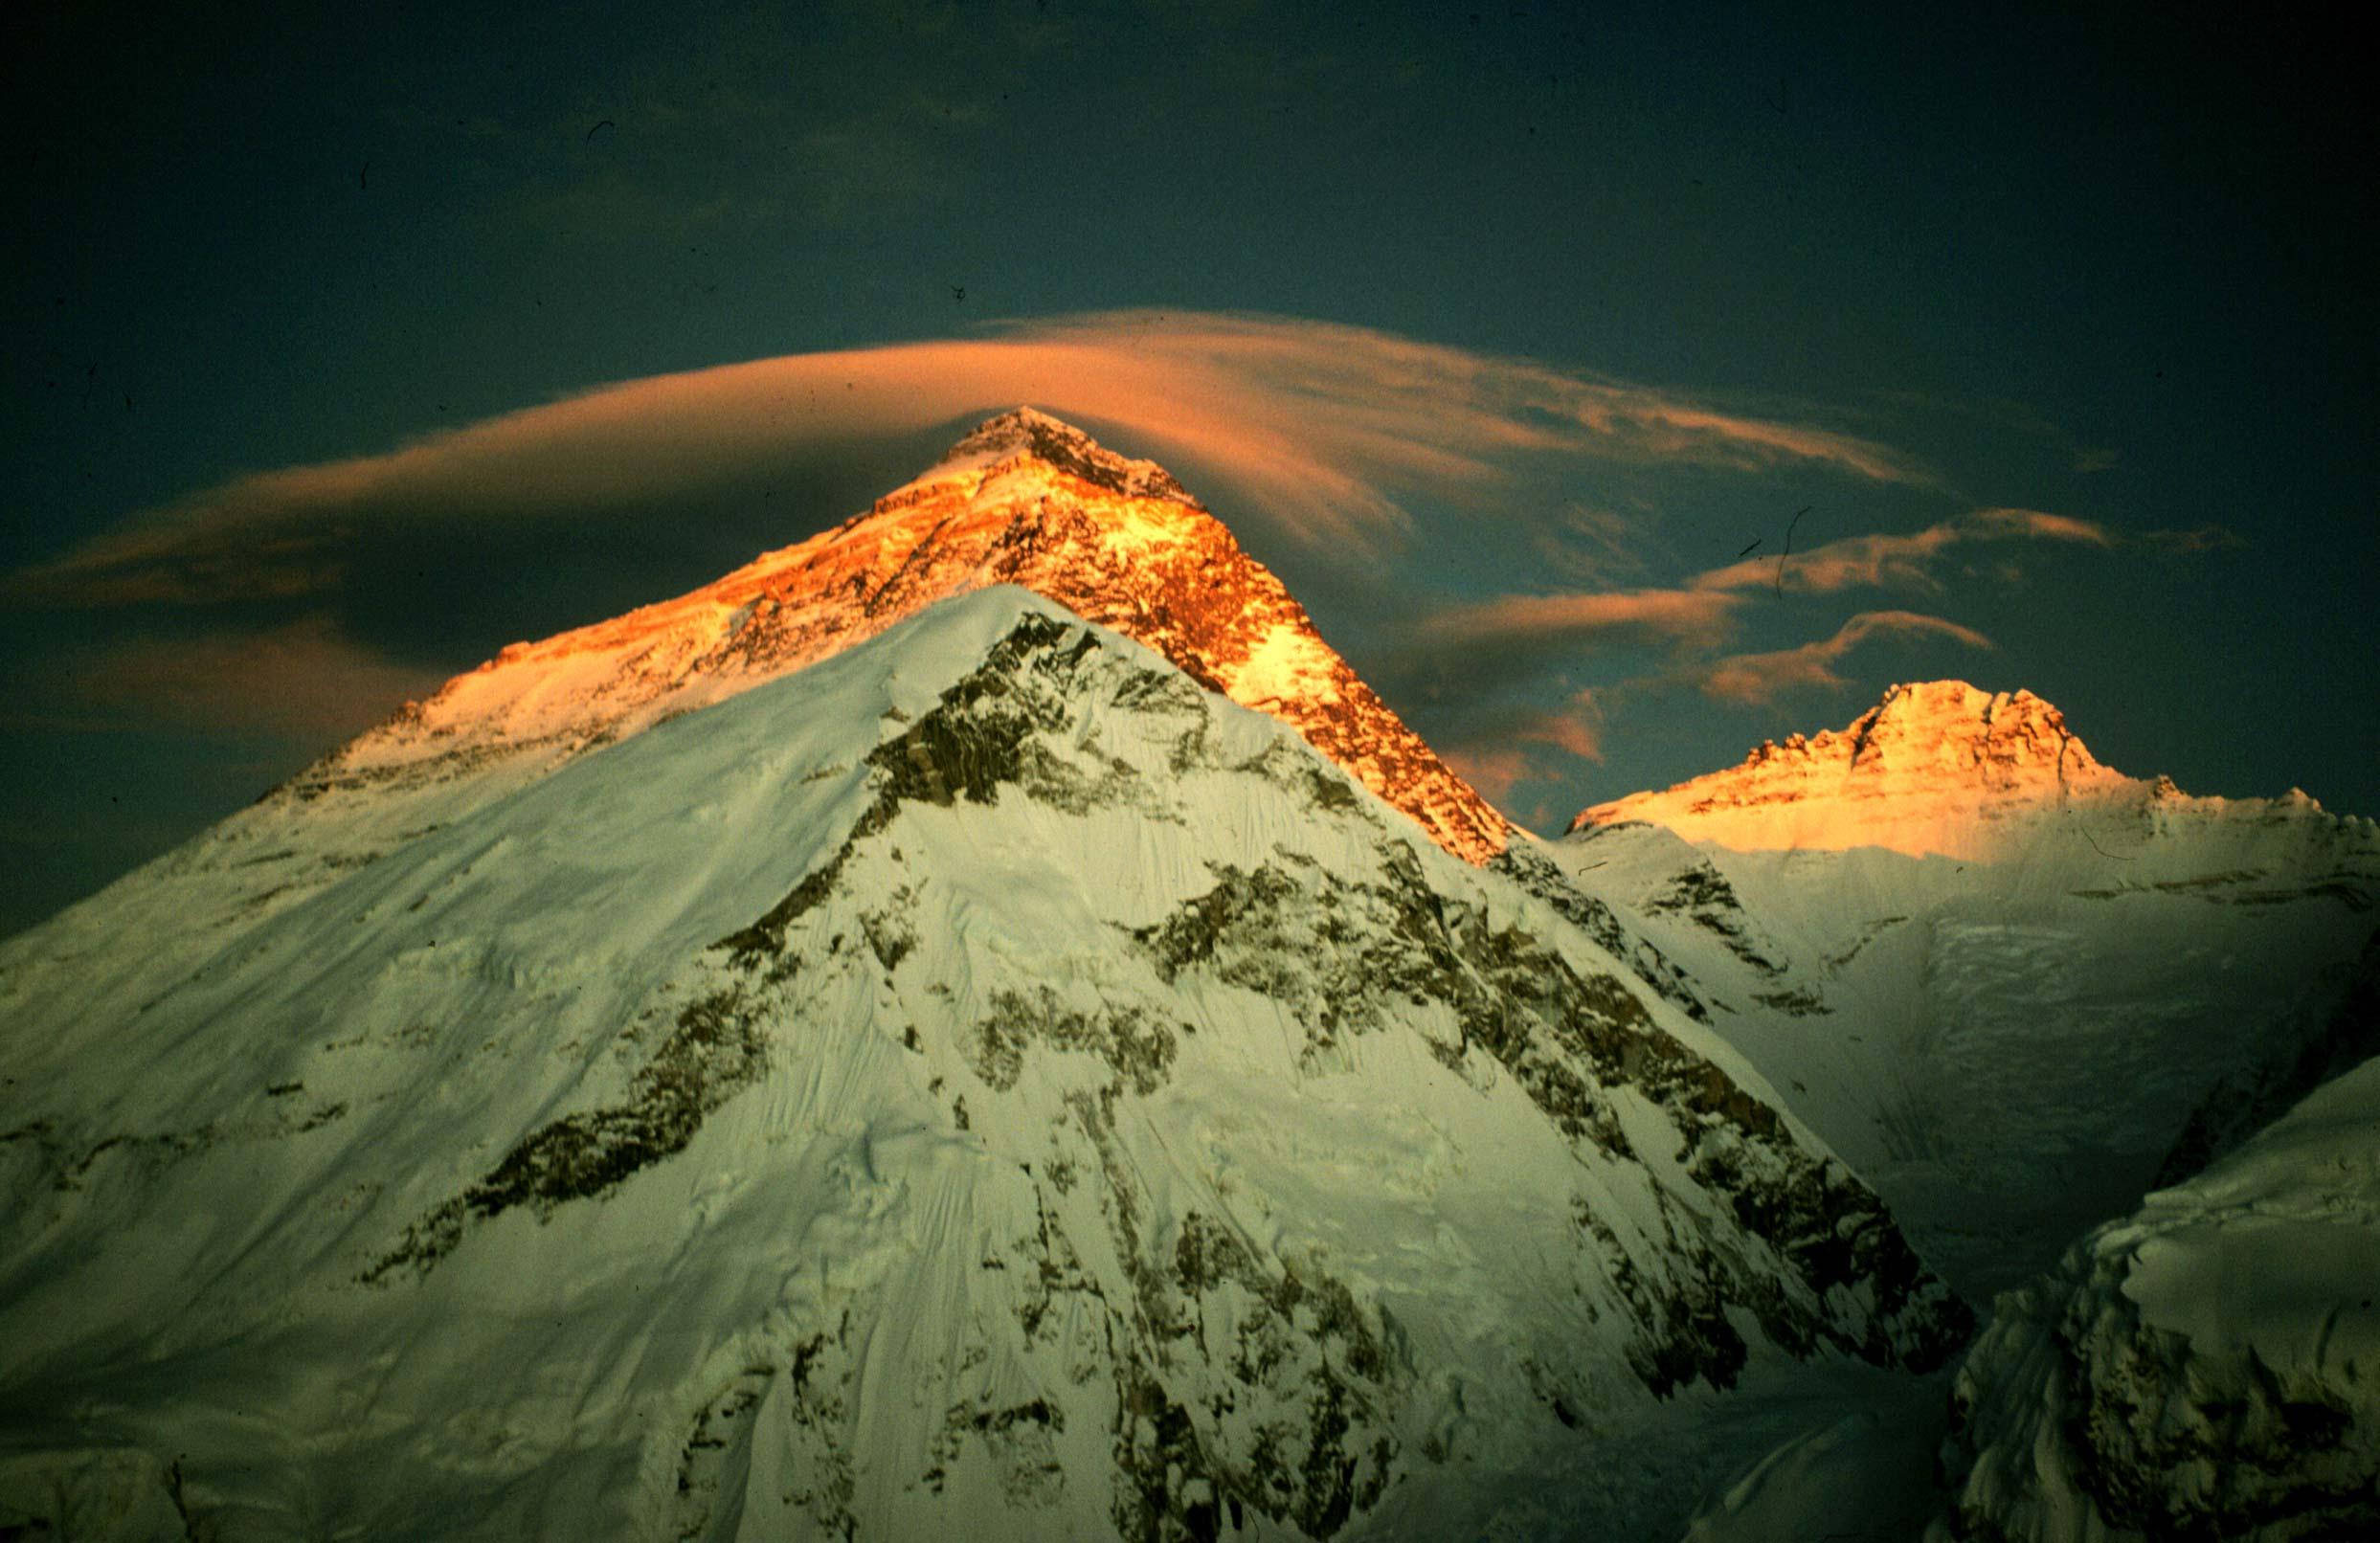 File:Everest - Polish International Mt Everest expedition 99.jpg